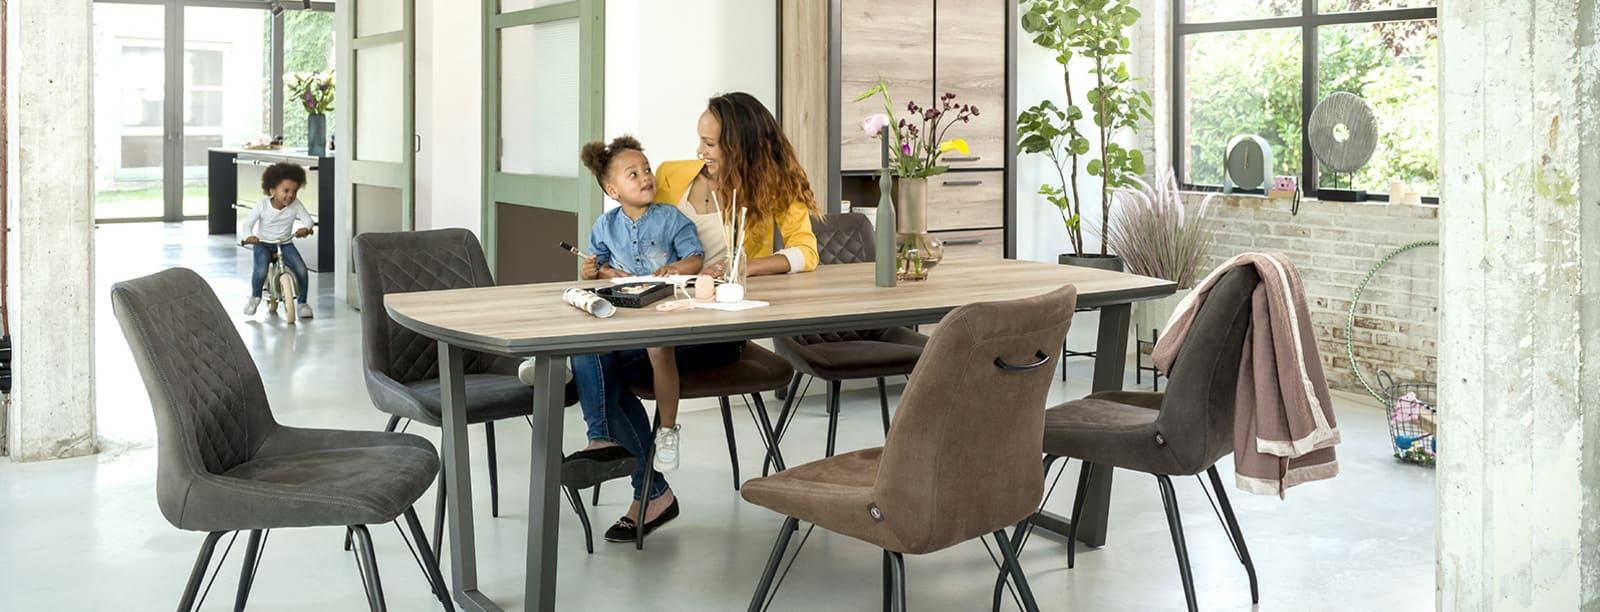 compacte meubels in een modern jasje